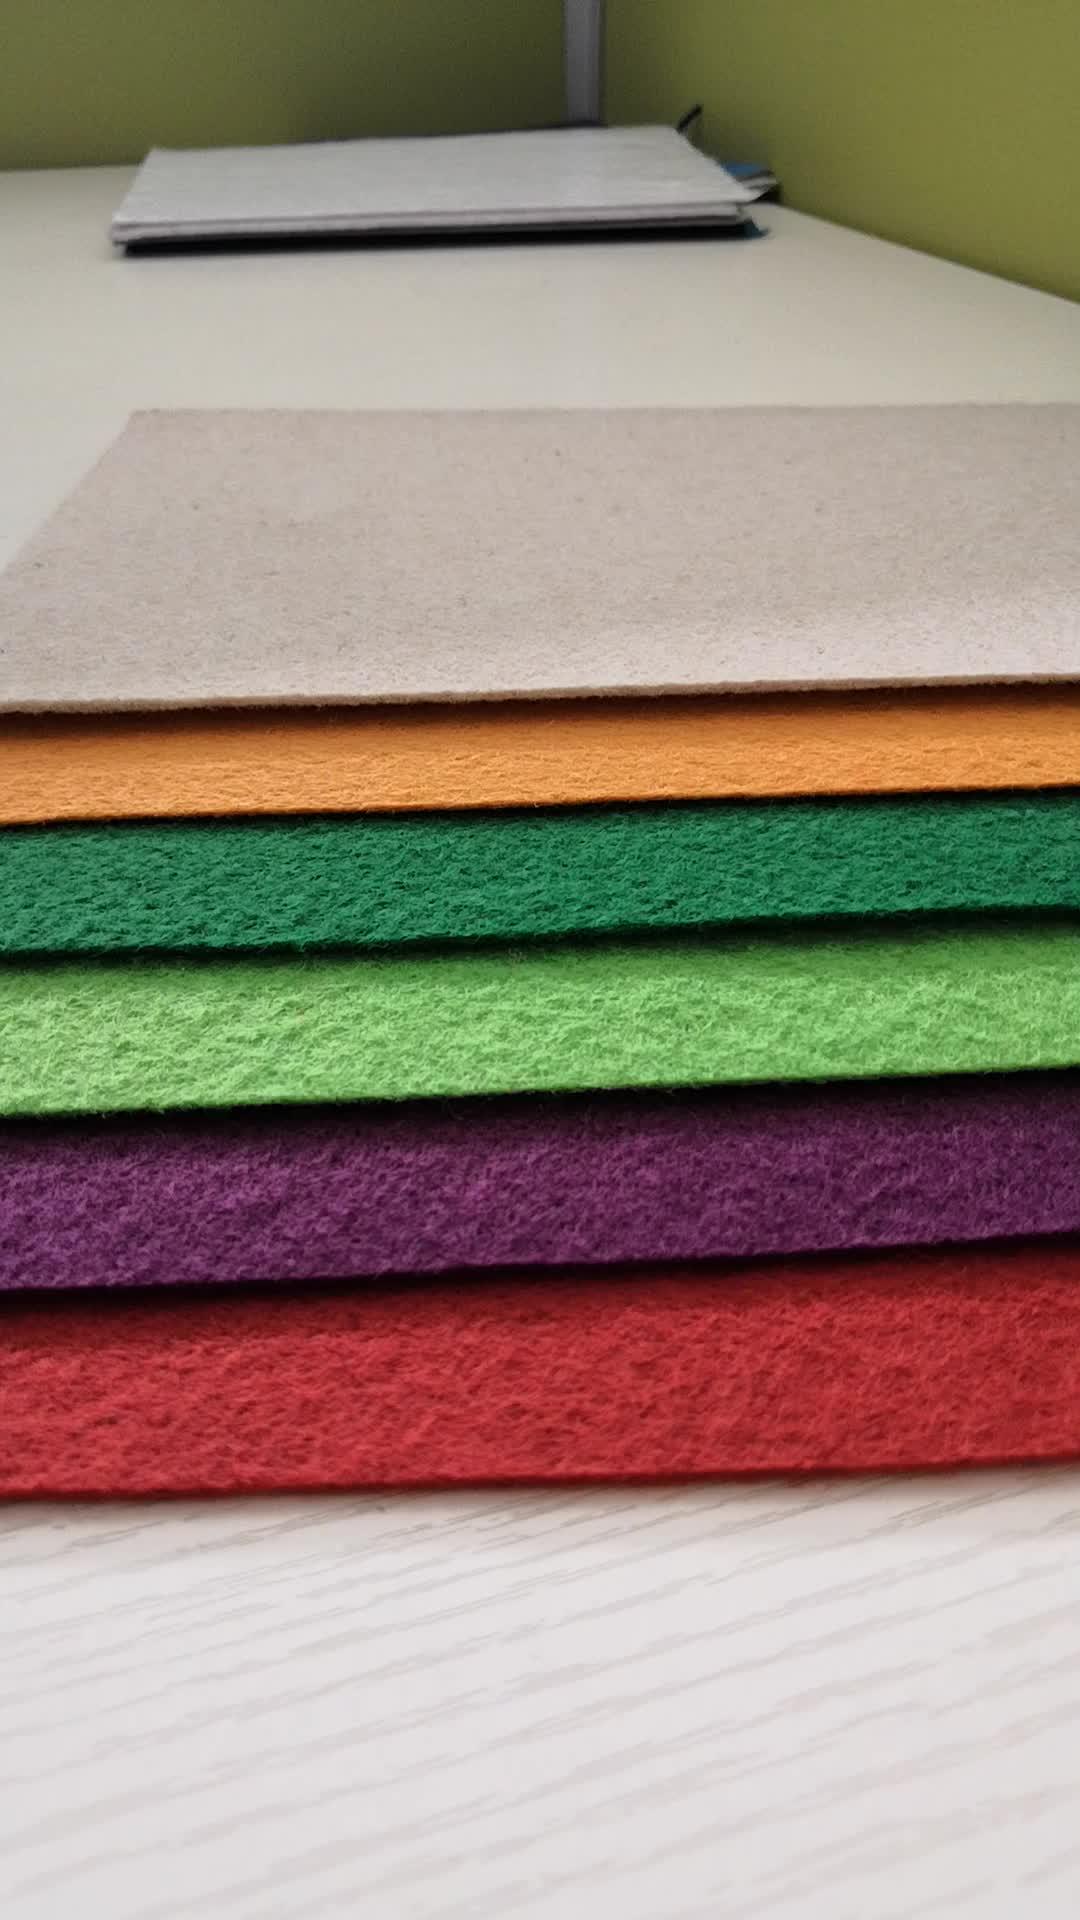 Most popular 벽 에 벽 nonwoven 바늘 일종 인 펀치 exhibition/홈/호텔/축 하 plain 카펫